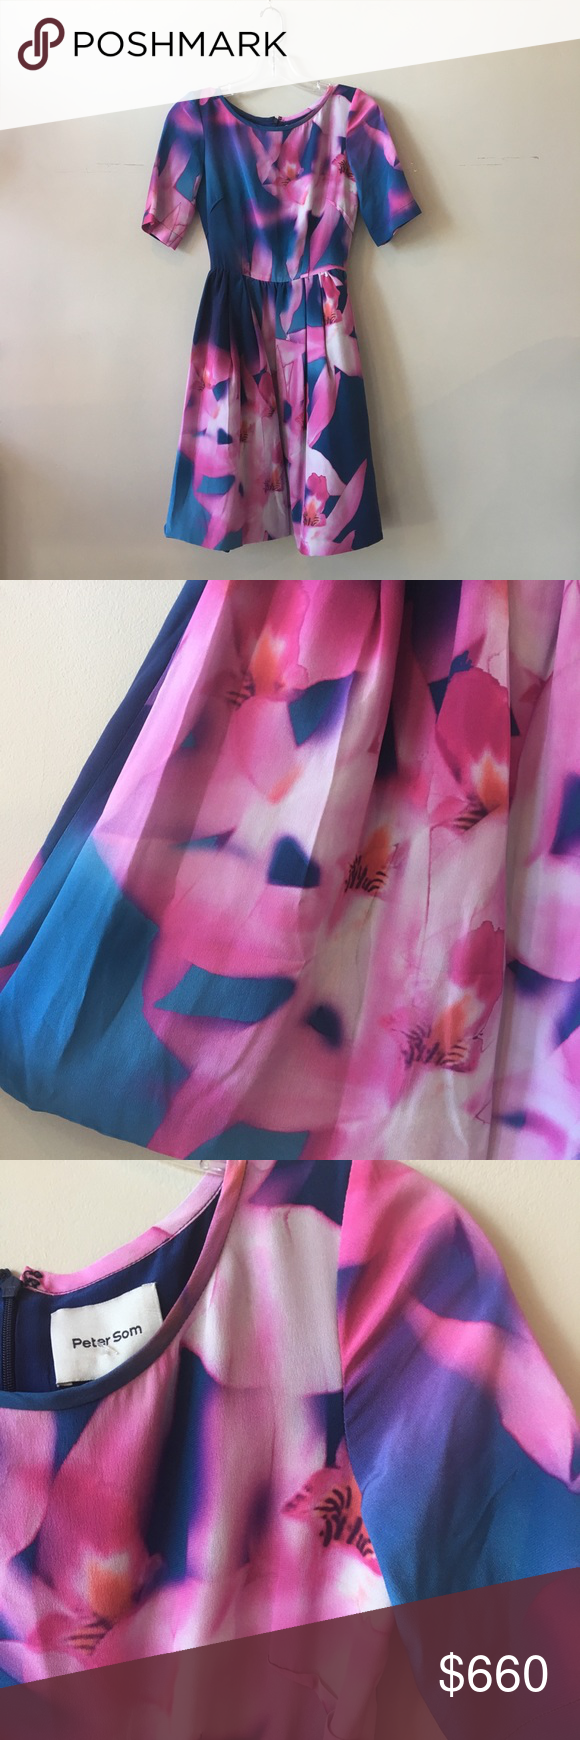 "Peter Som Orchid Dress Soft purple orchid dress  Bust: 16"" Length: 35""  HLC 1201-1295 Peter Som Dresses Midi"